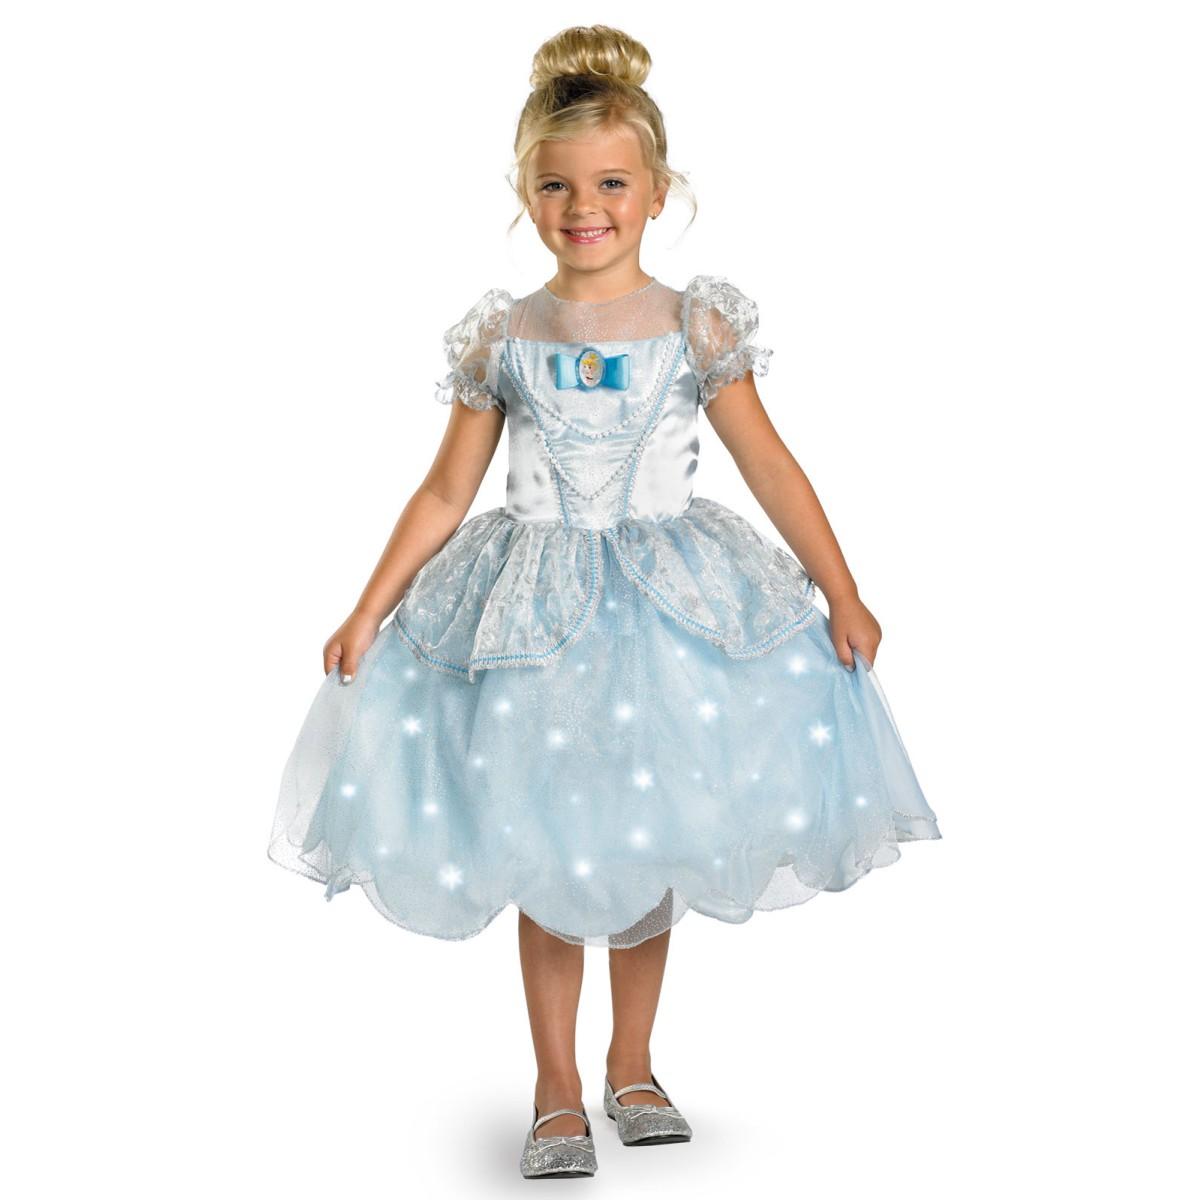 acomes | Rakuten Global Market: Disney cosplay kid dresses ...